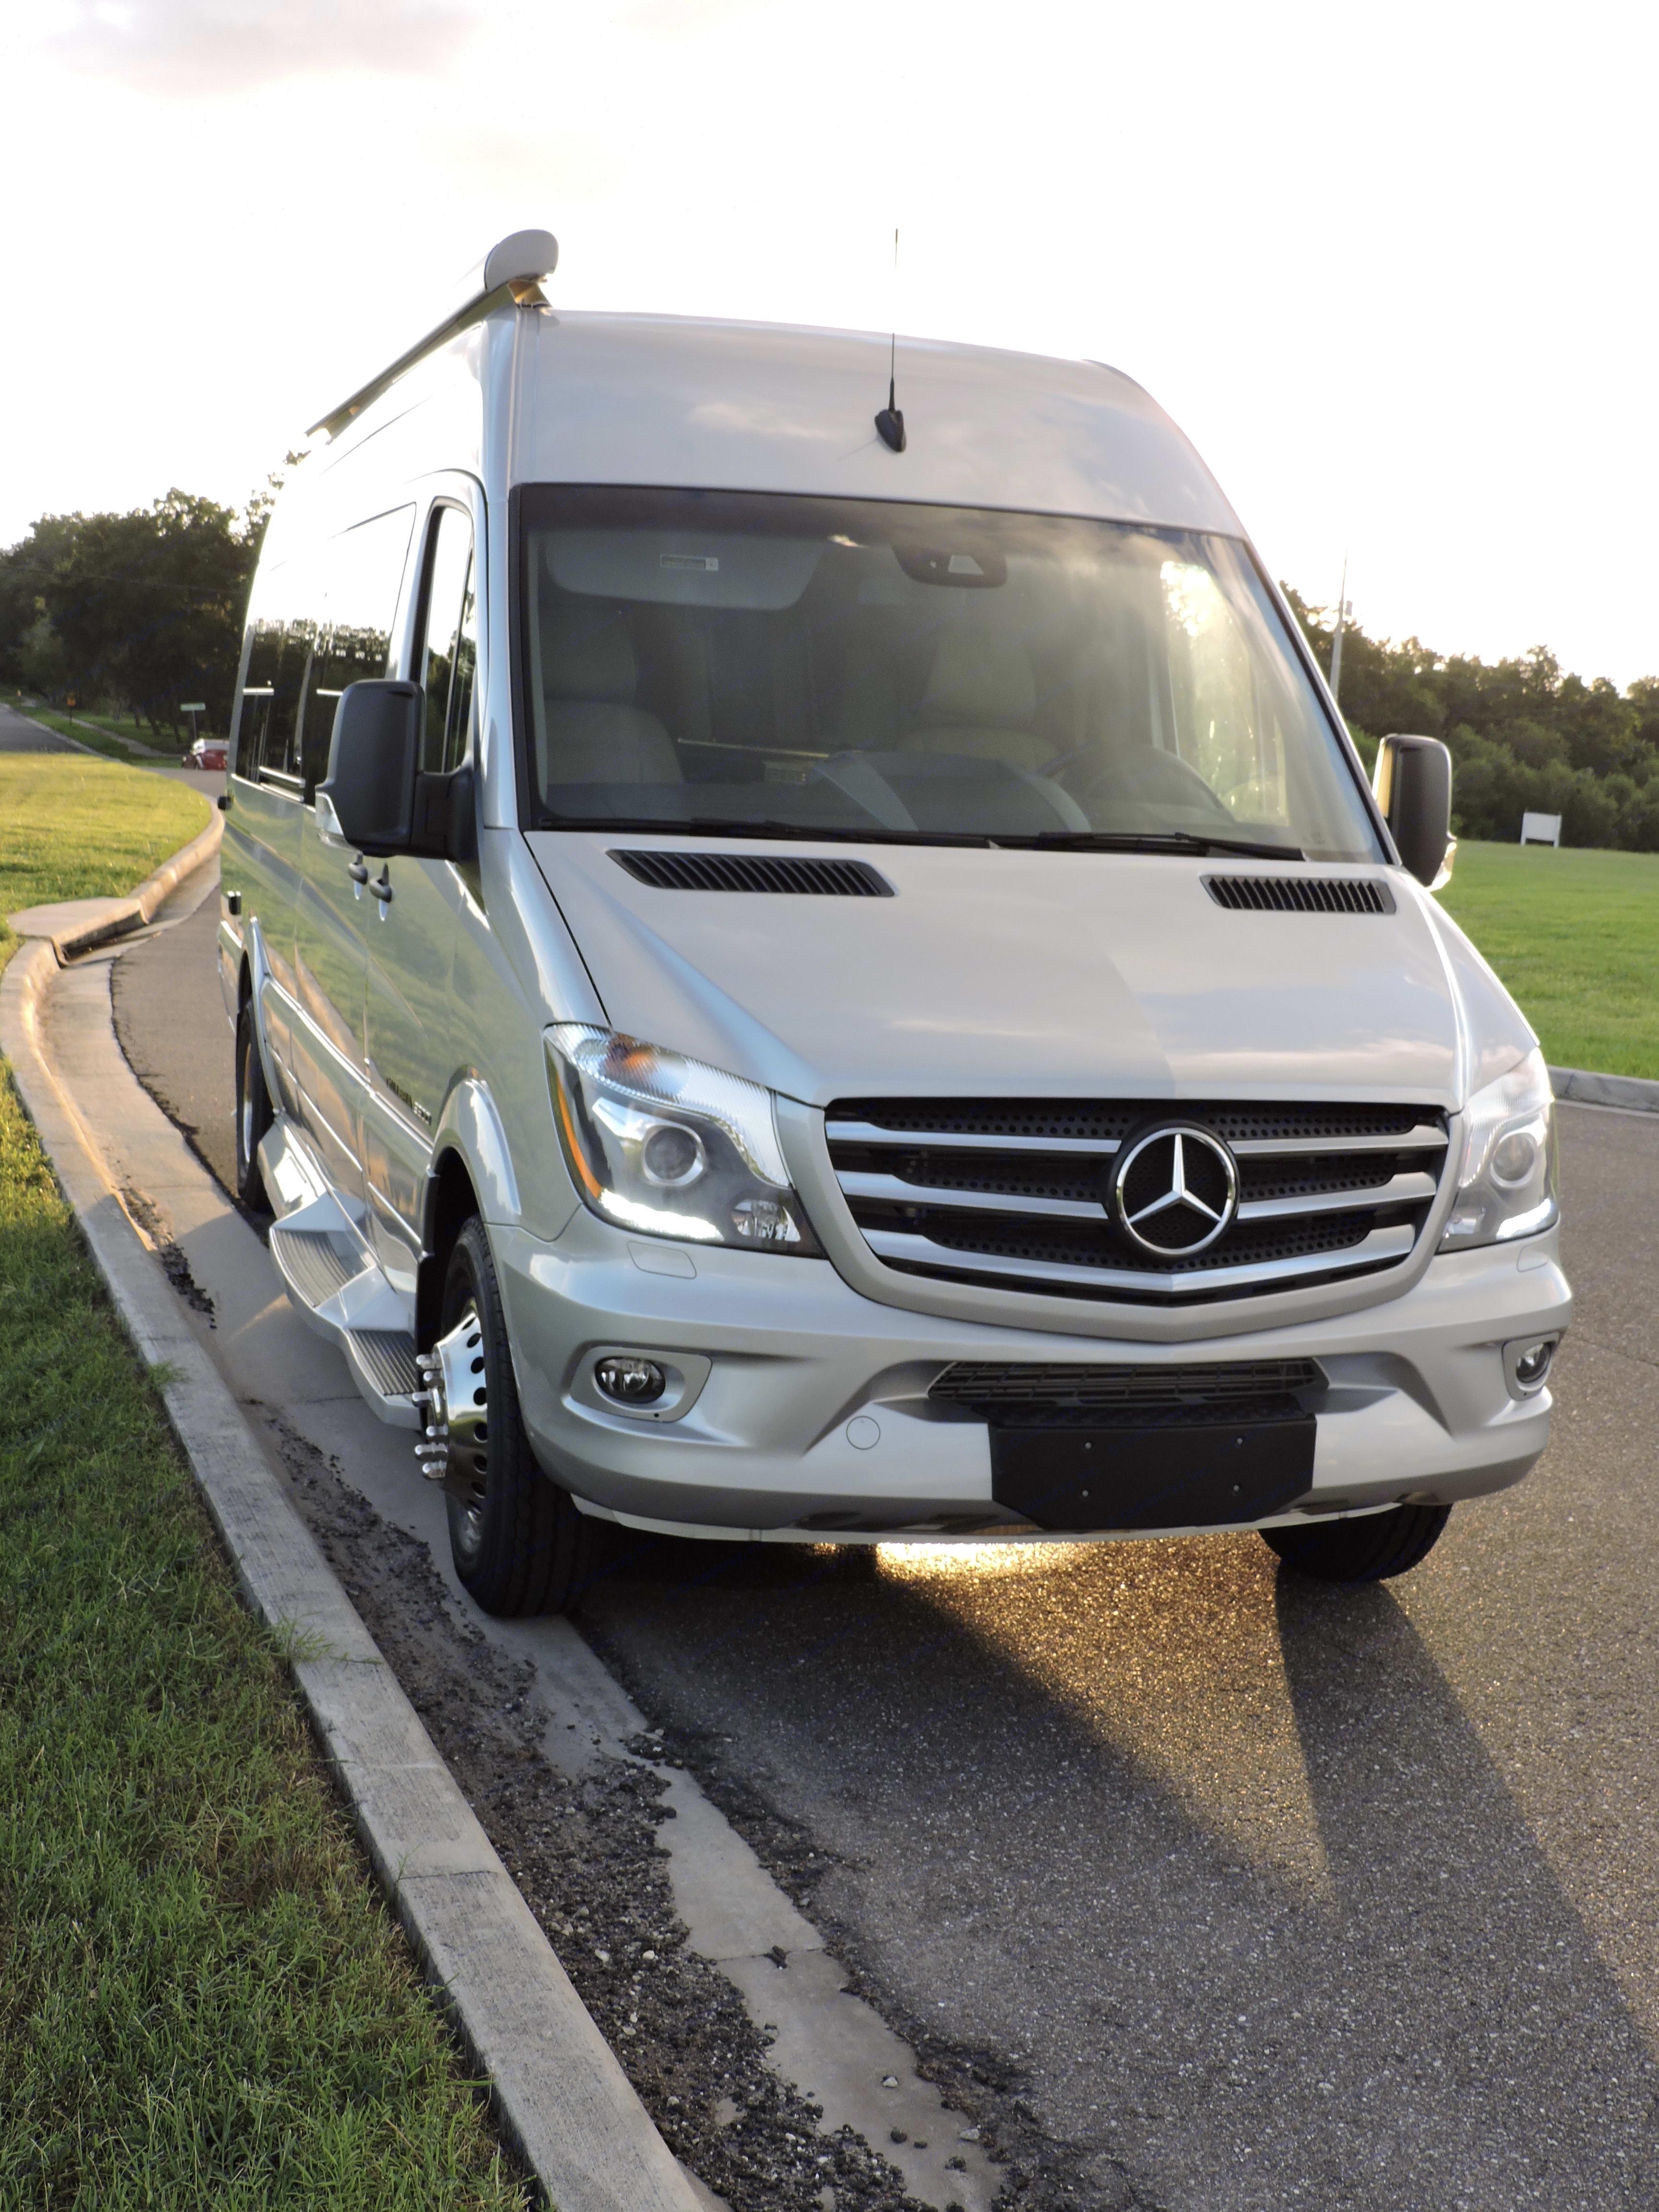 Front view - Mercedes Benz Sprinter. Coachmen Galleria 2018